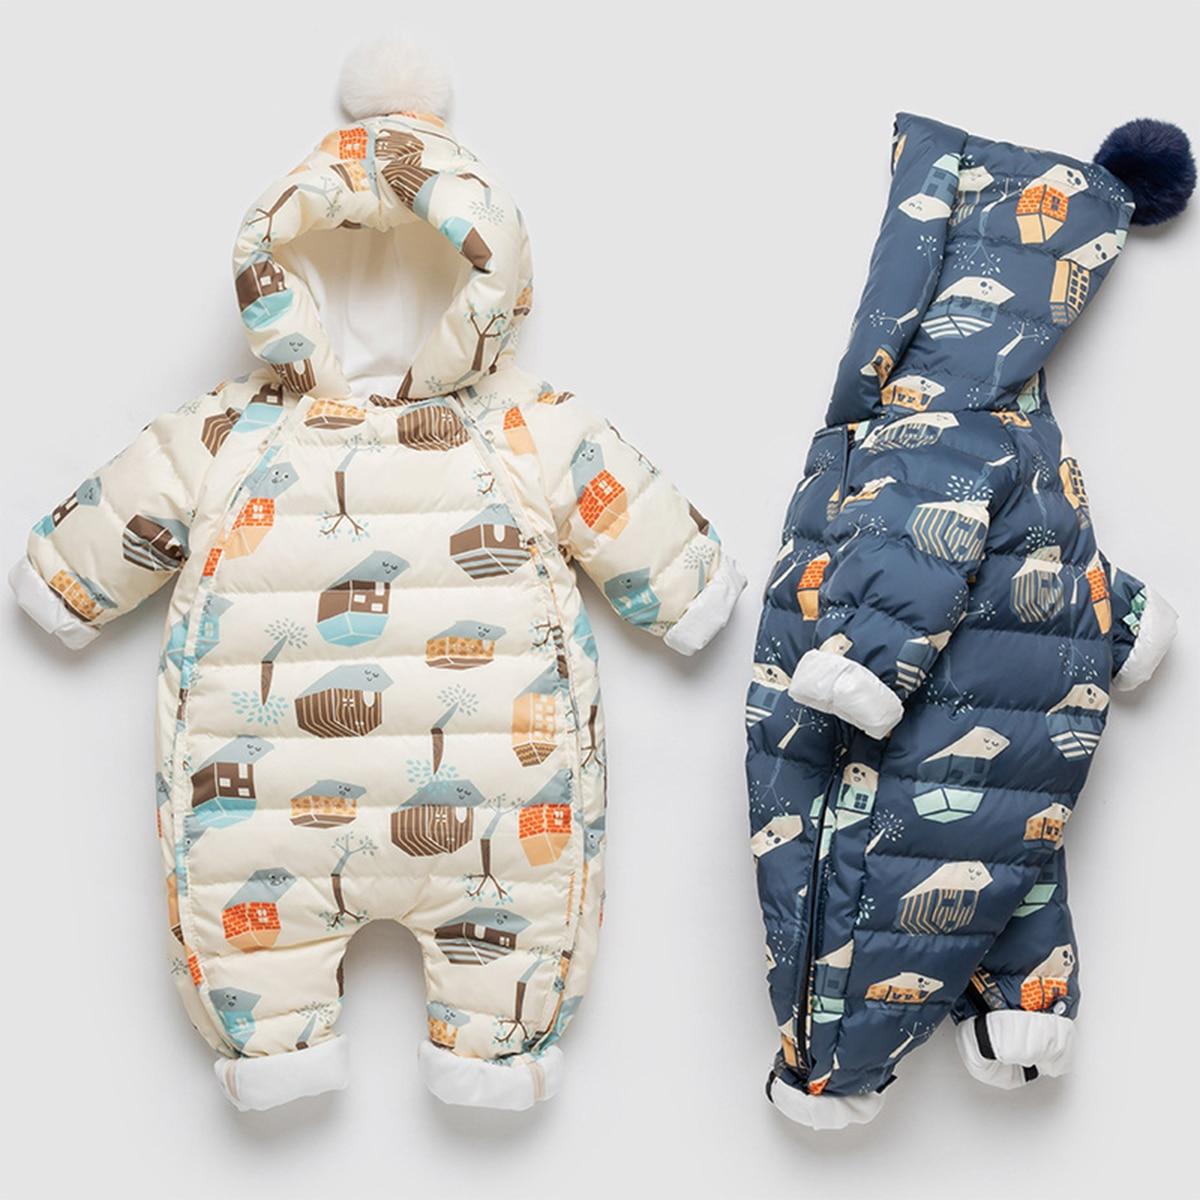 2021-velvet-baby-winter-snowsuit-hooded-catoon-printing-newborn-rompers-girls-down-overalls-infant-boys-jumpsuit